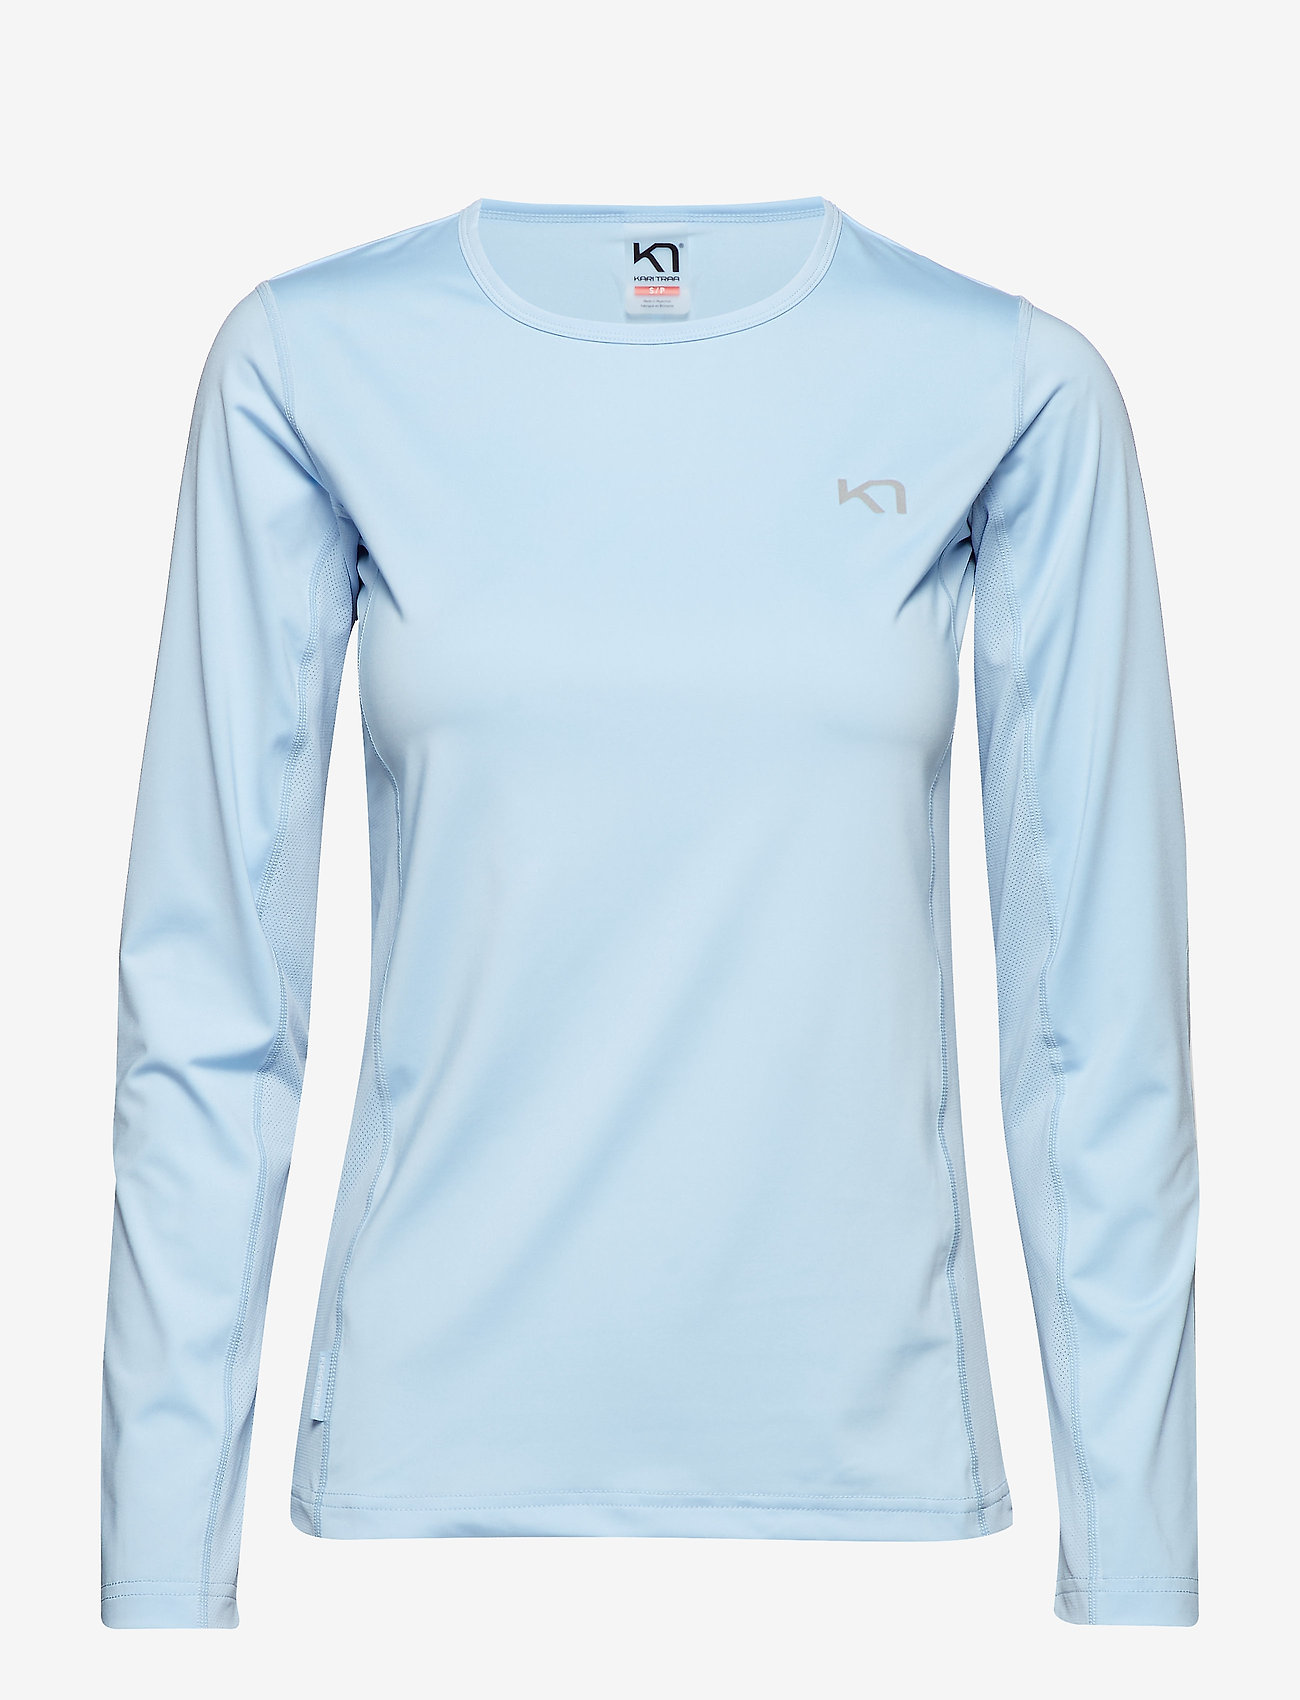 Kari Traa - NORA LS - logo t-shirts - cloud - 0